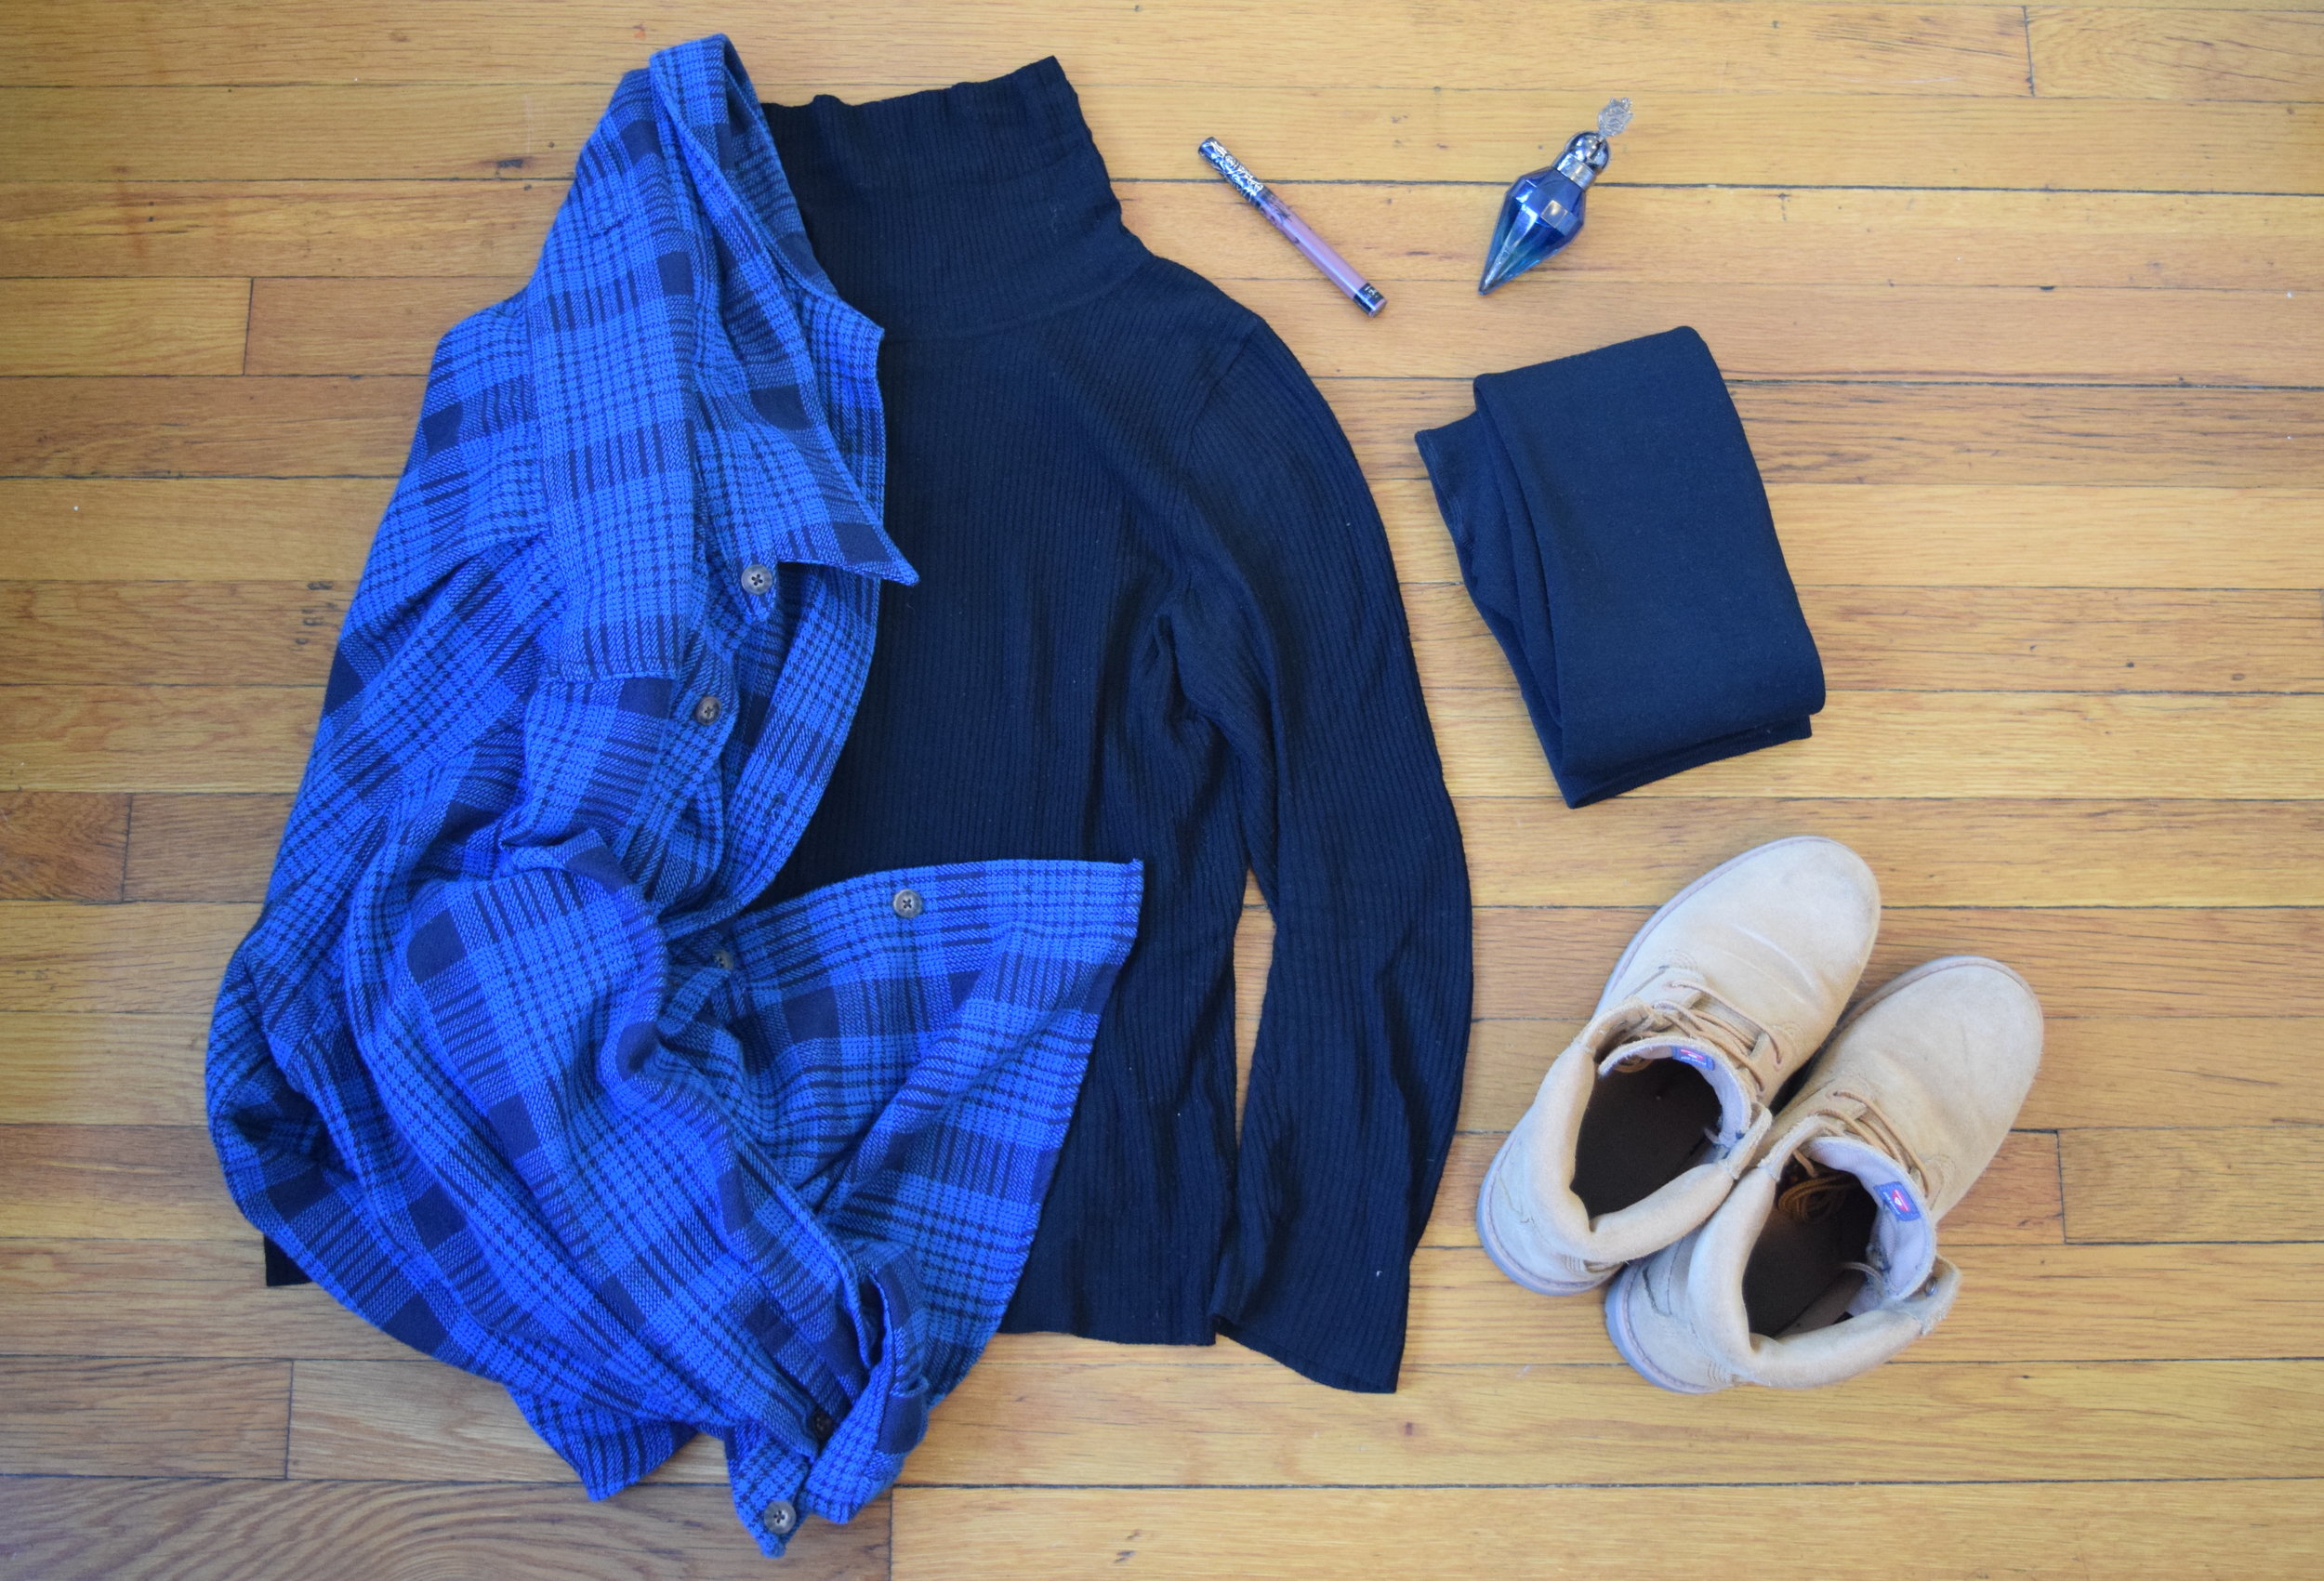 turtleneck  (similar).  flannel .  leggings .  boots .  lipgloss (in Sanctuary).  perfume .